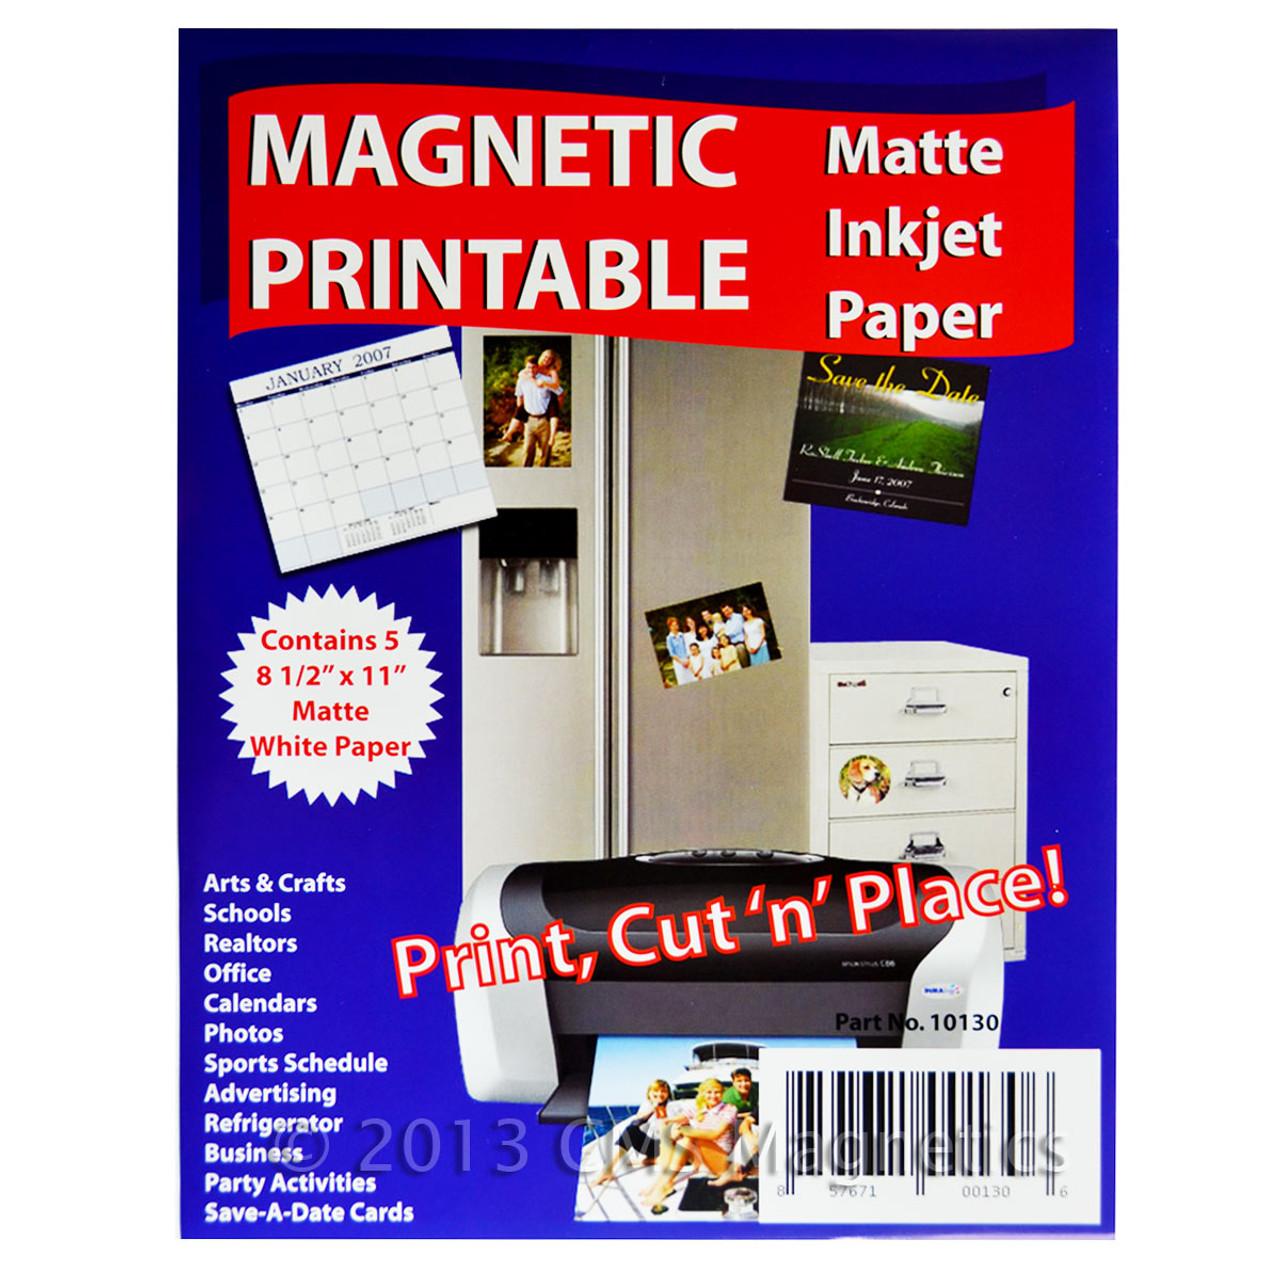 magnetic paper inkjet a4a matte white